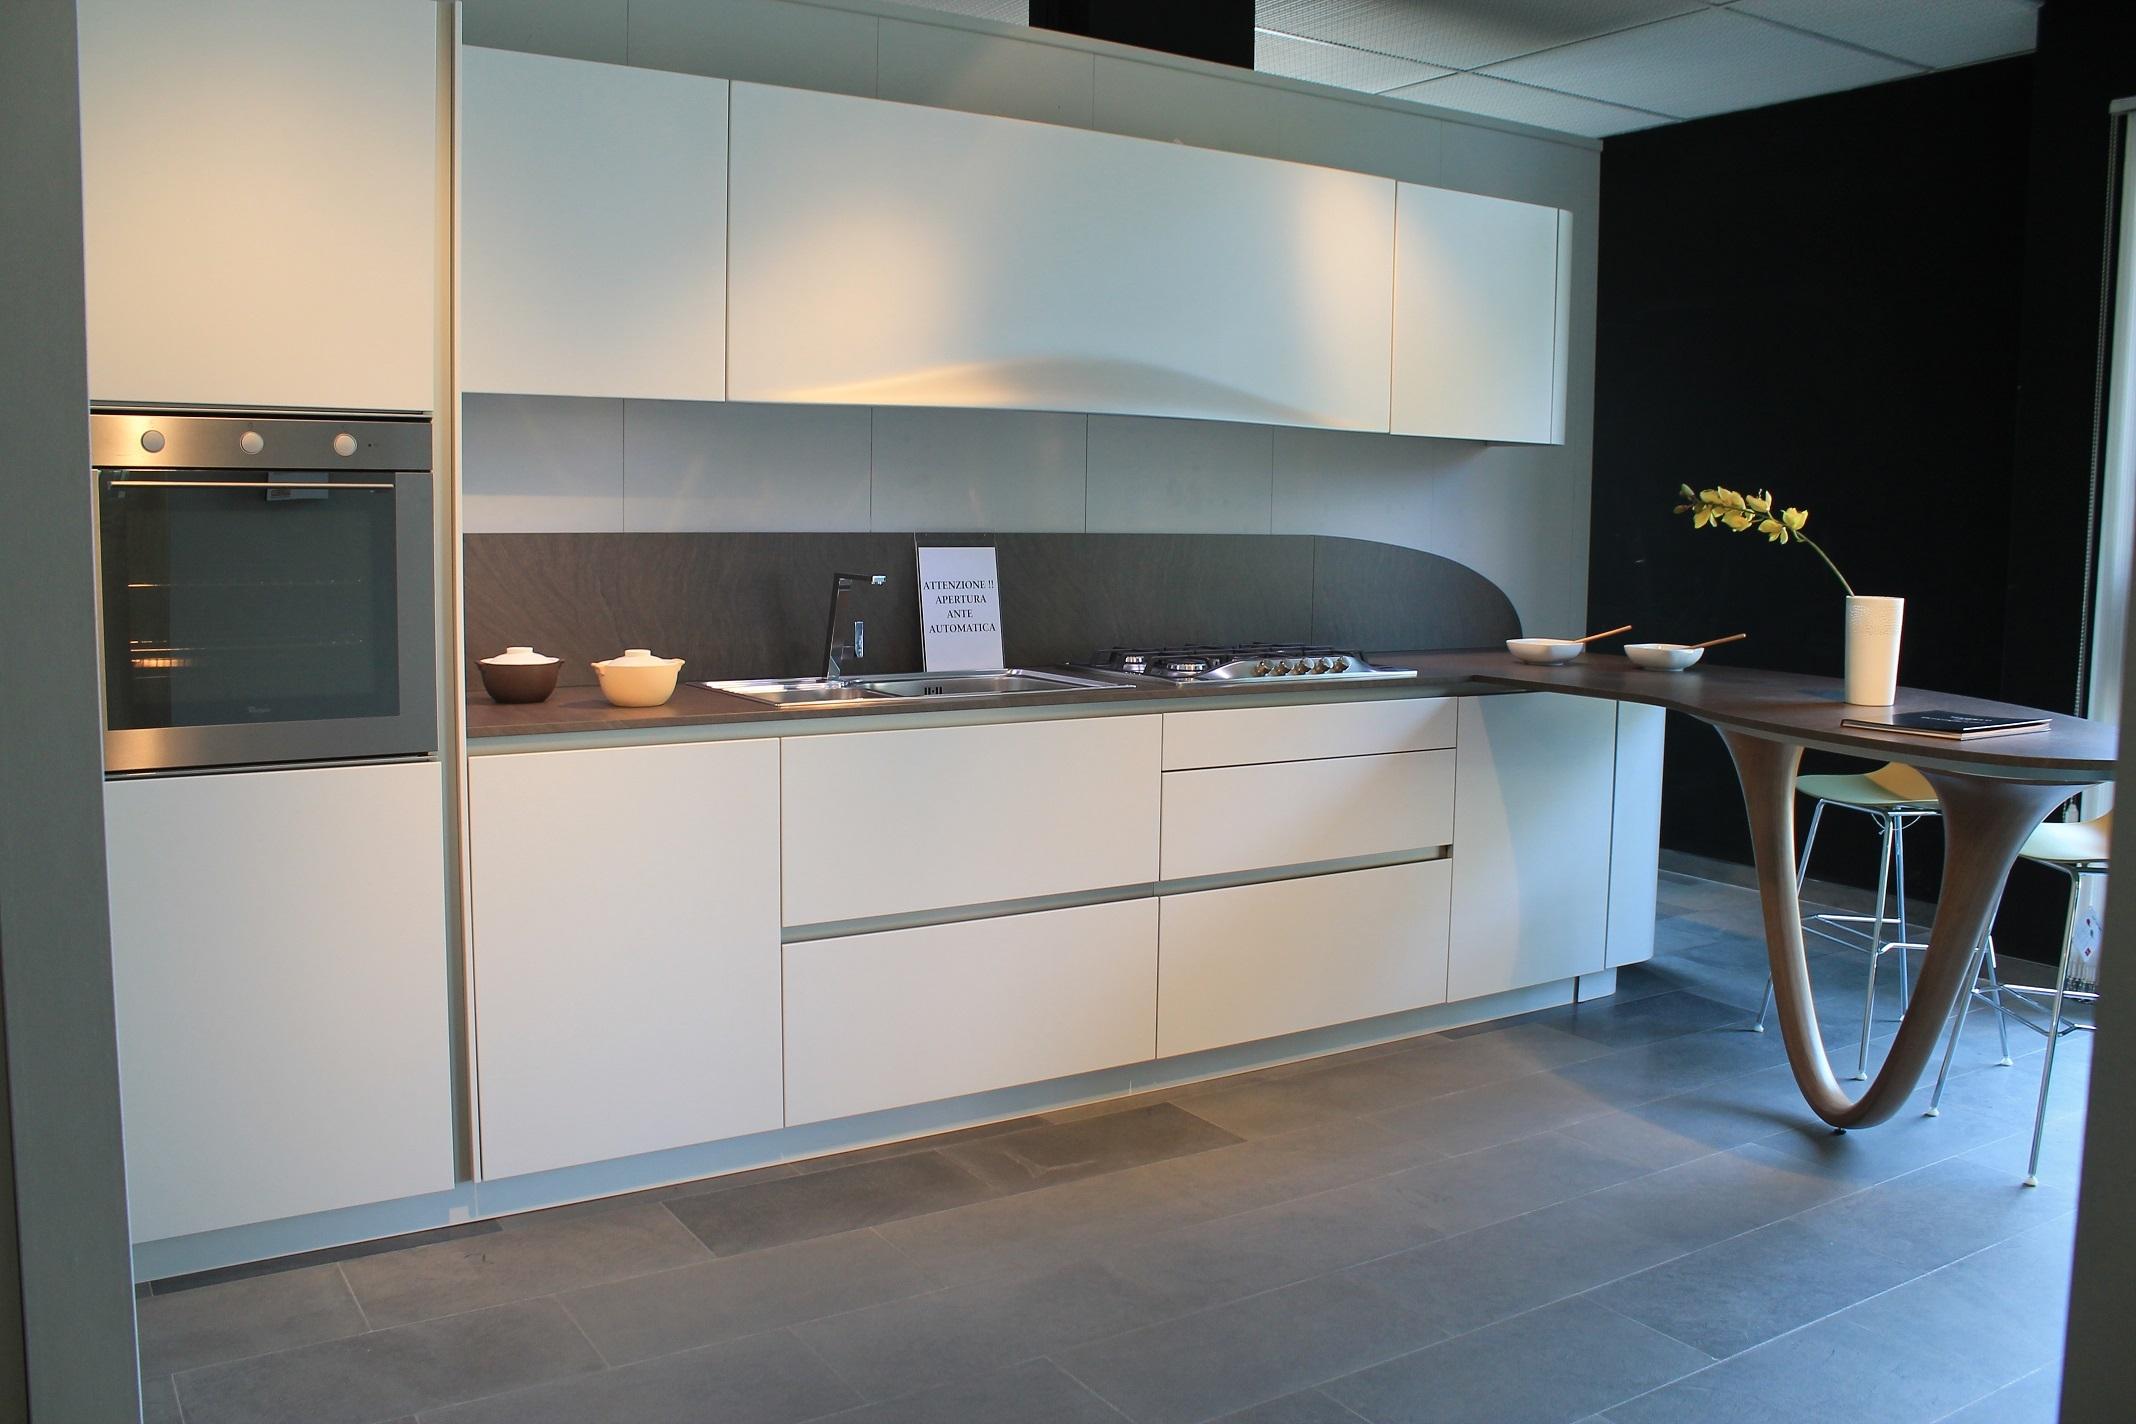 Cucina snaidero ola 20 cucine a prezzi scontati - Cucine snaidero moderne ...